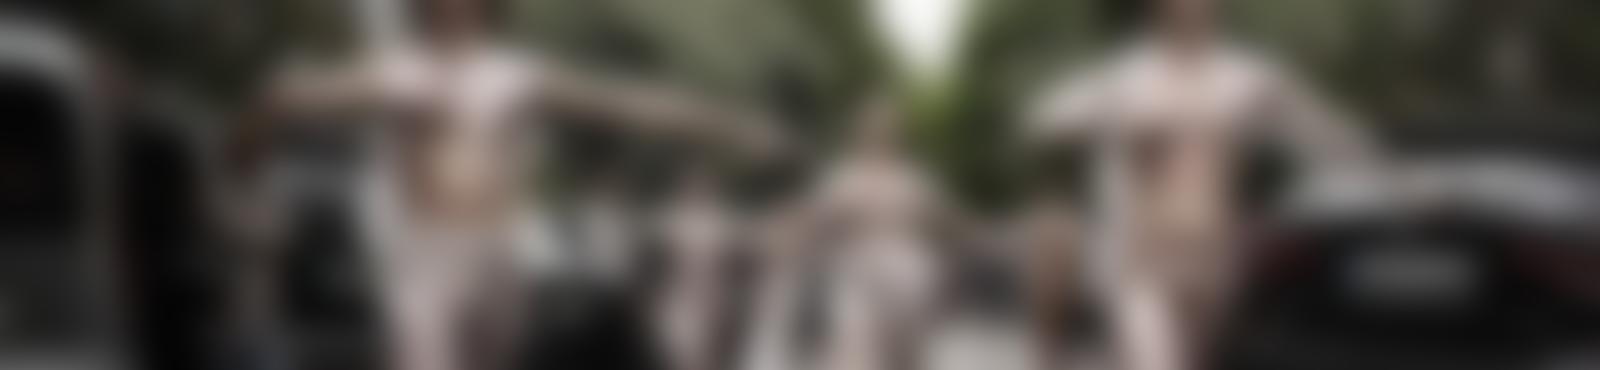 Blurred 9a7fe820 04a0 47e0 8b1c bc848b205304